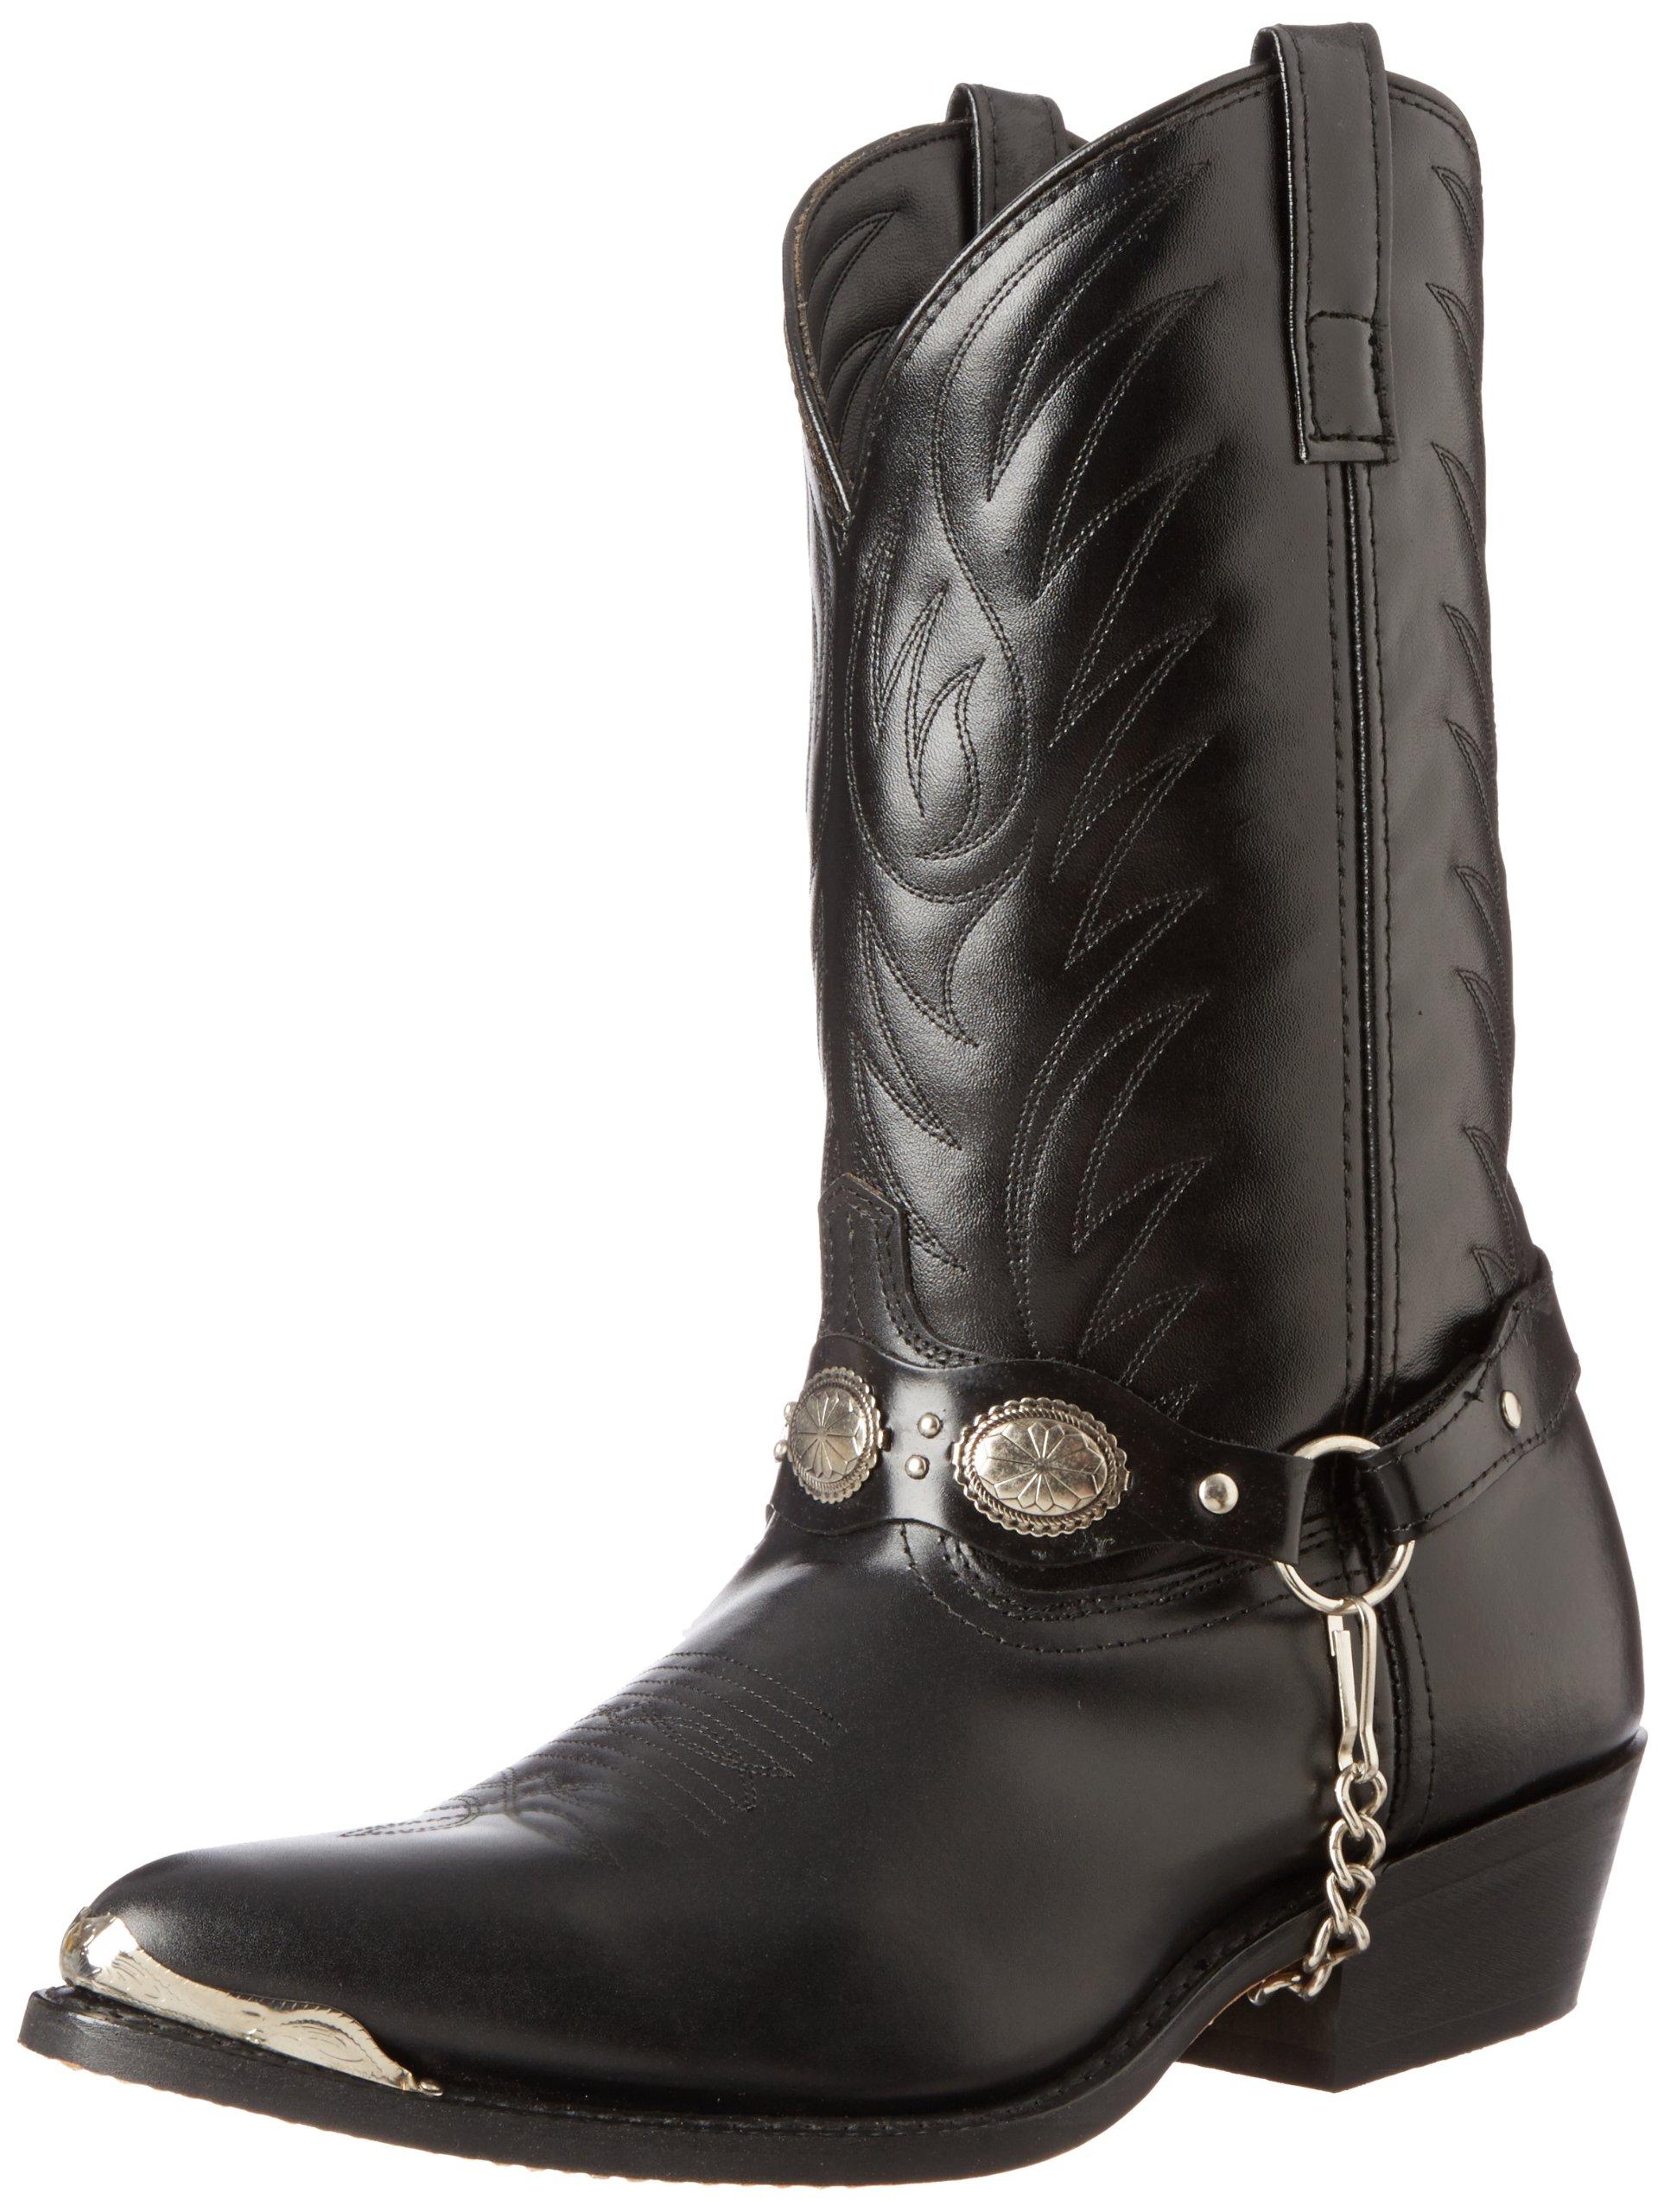 Laredo Men's Tallahassee Western Boot,Black,10.5 D US